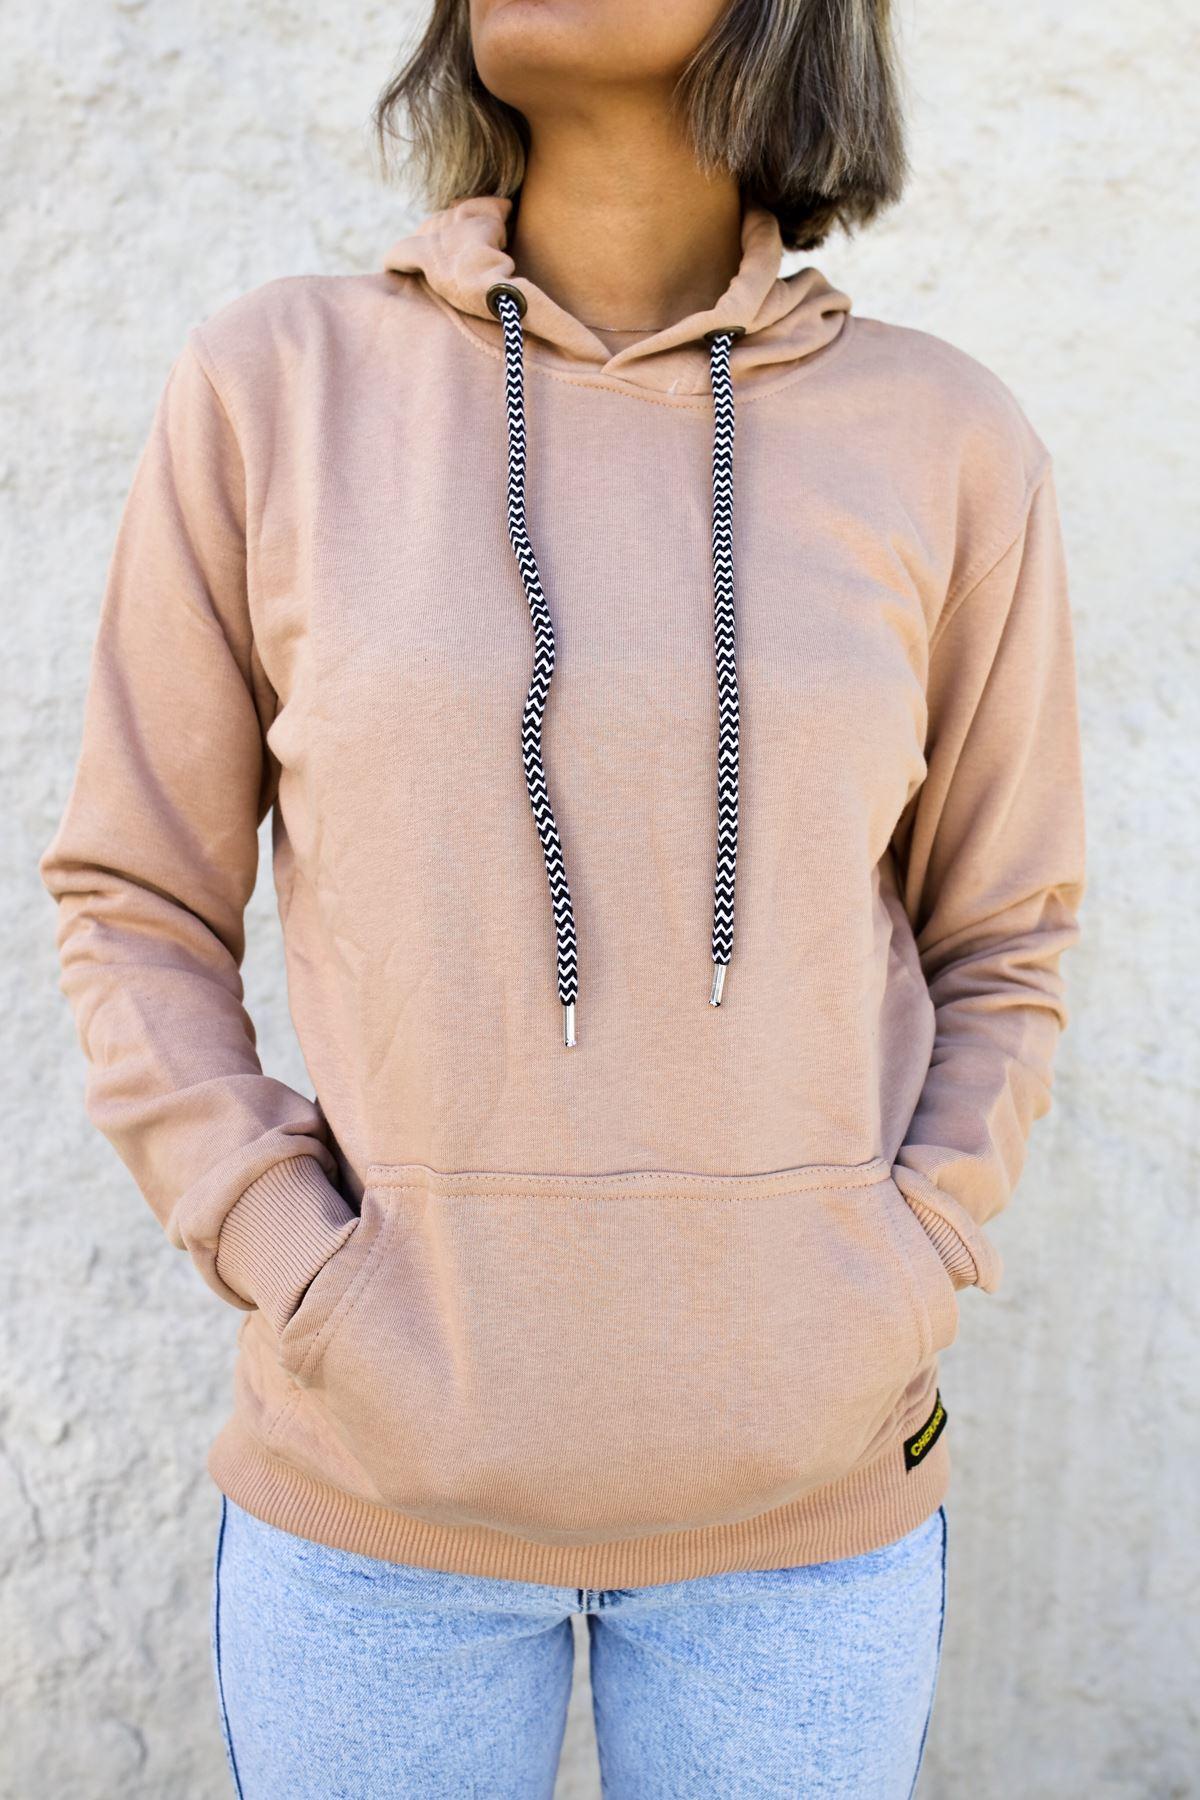 Kapüşonlu Kadın Sweatshirt GÜL KURUSU